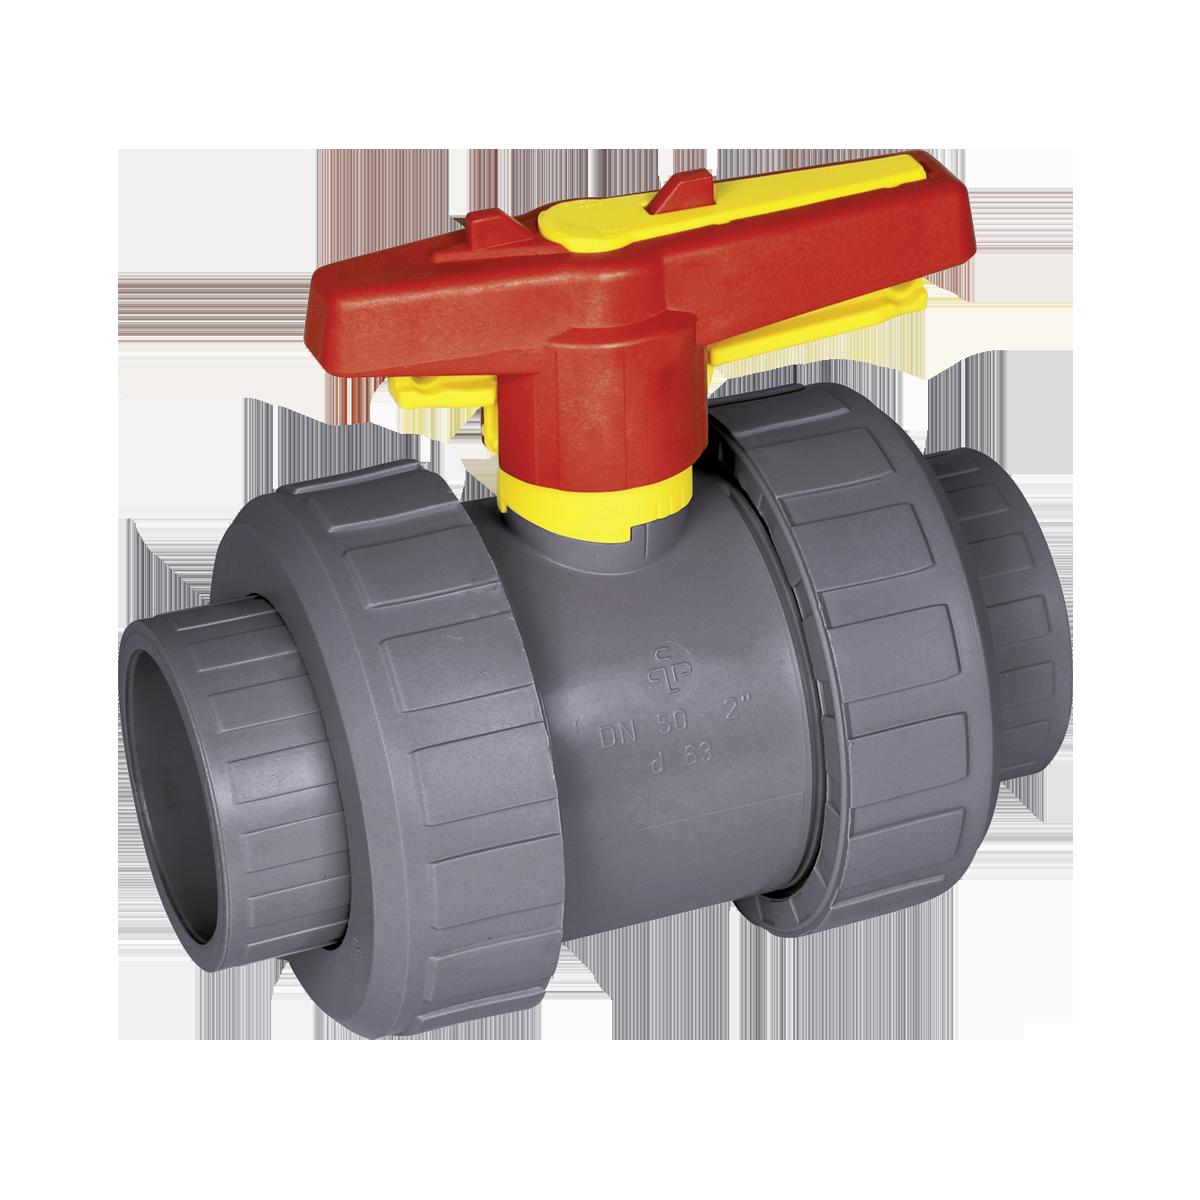 Praher 2-way ball valve S4 PVC-C, grey, red and yellow